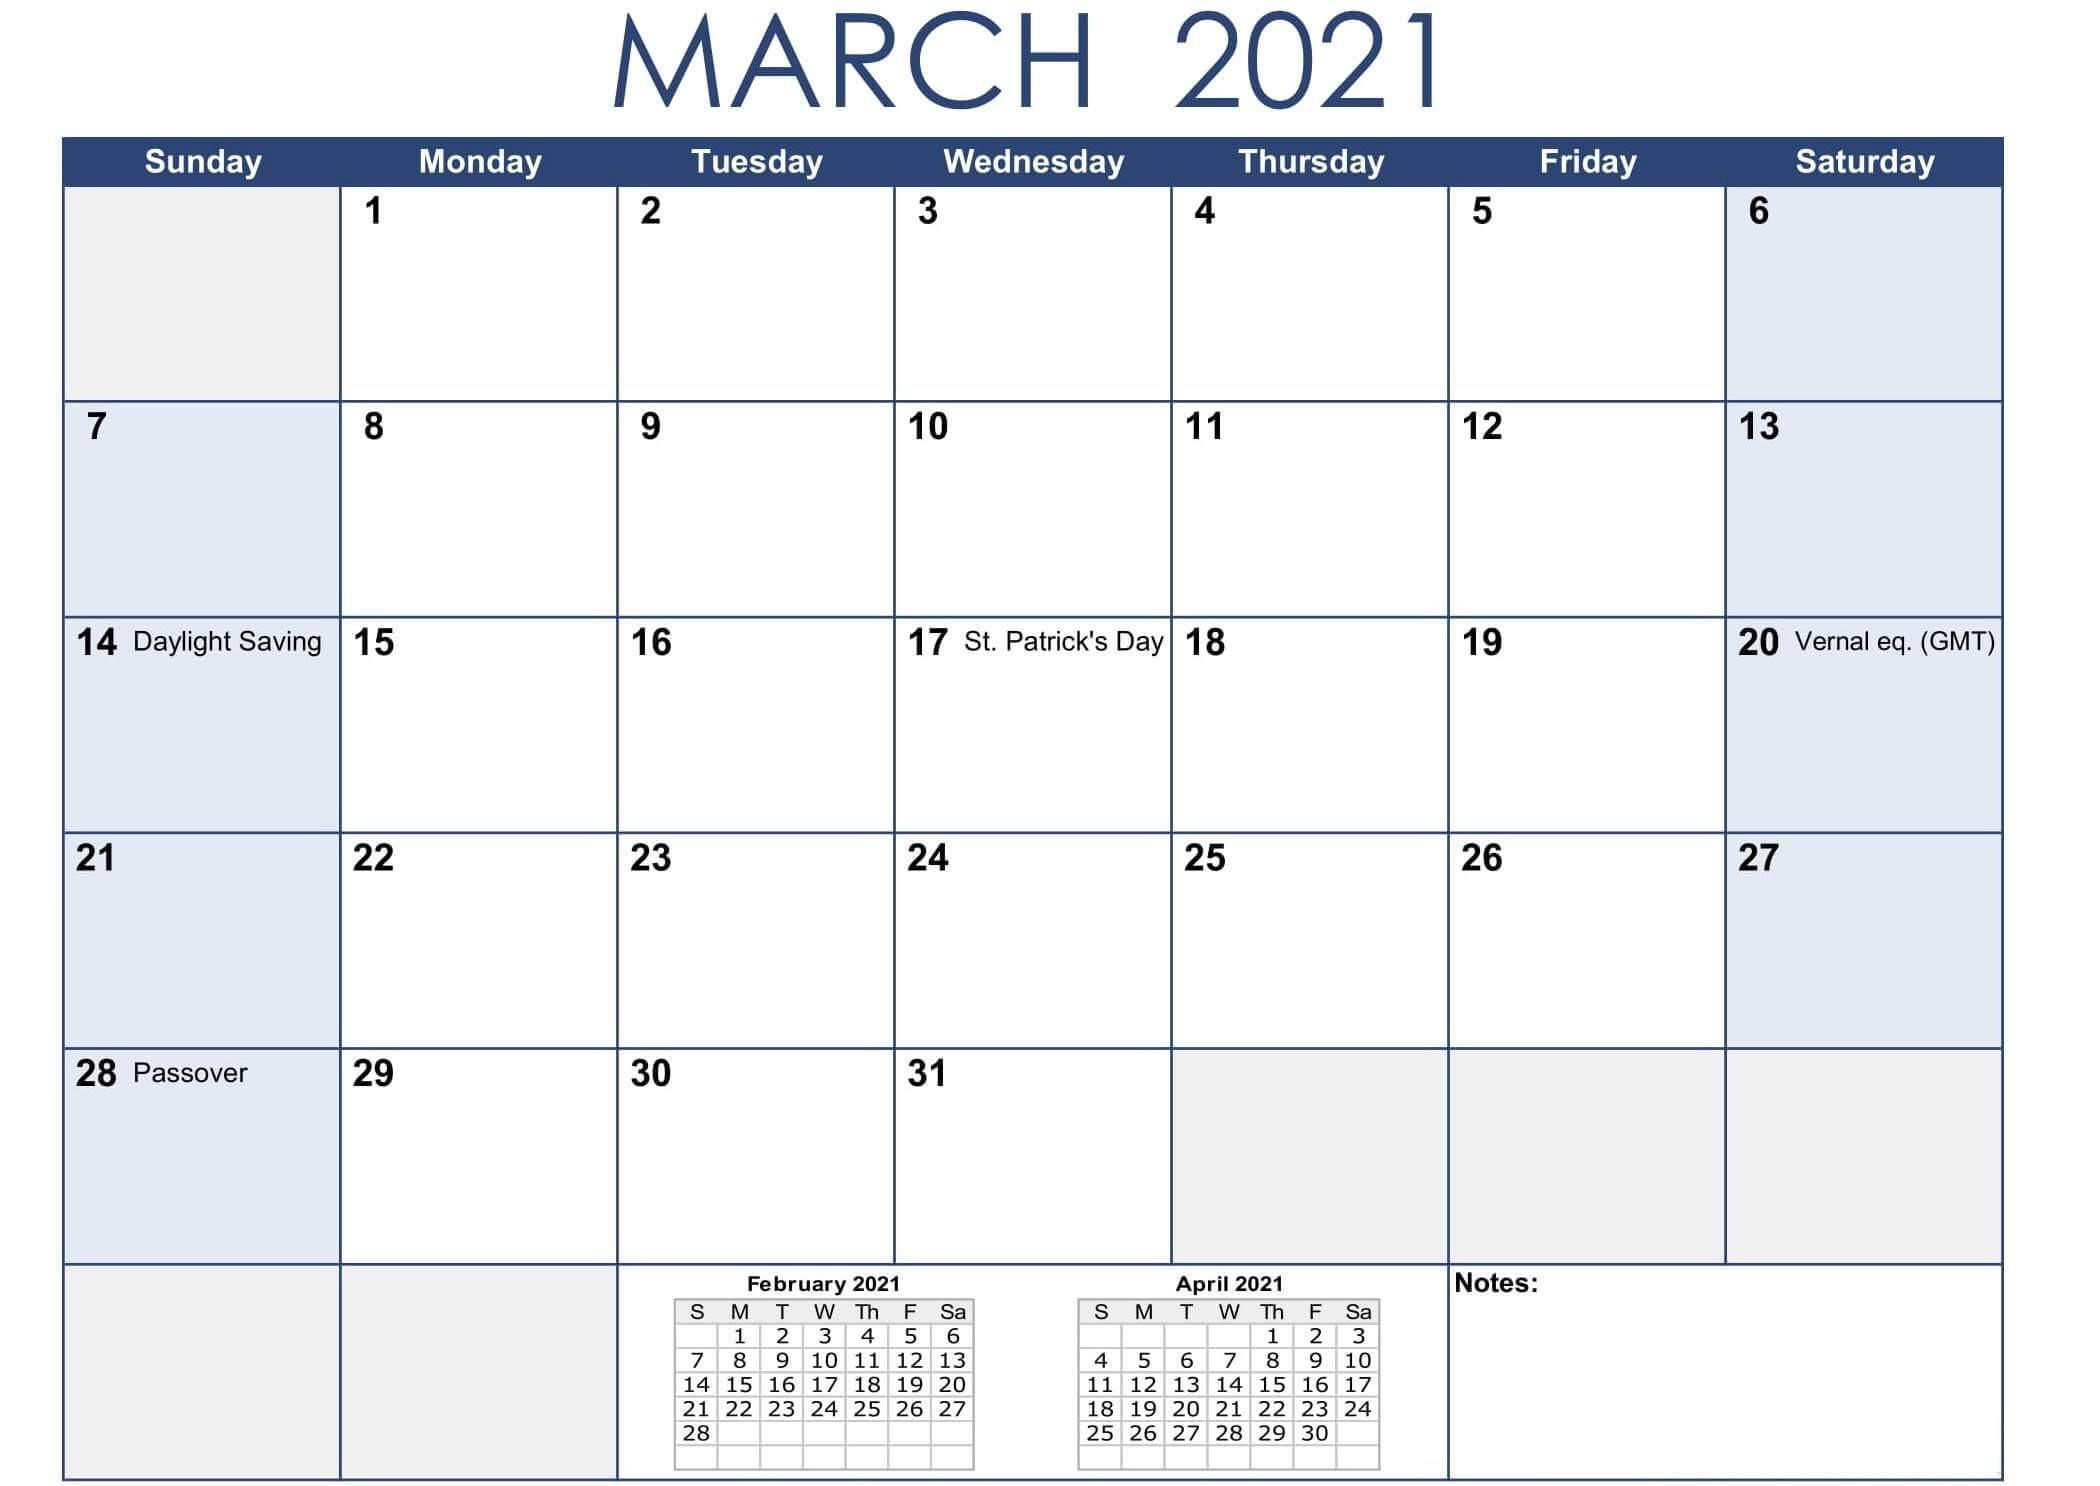 March 2021 Calendar Holidays Printable Printable fice